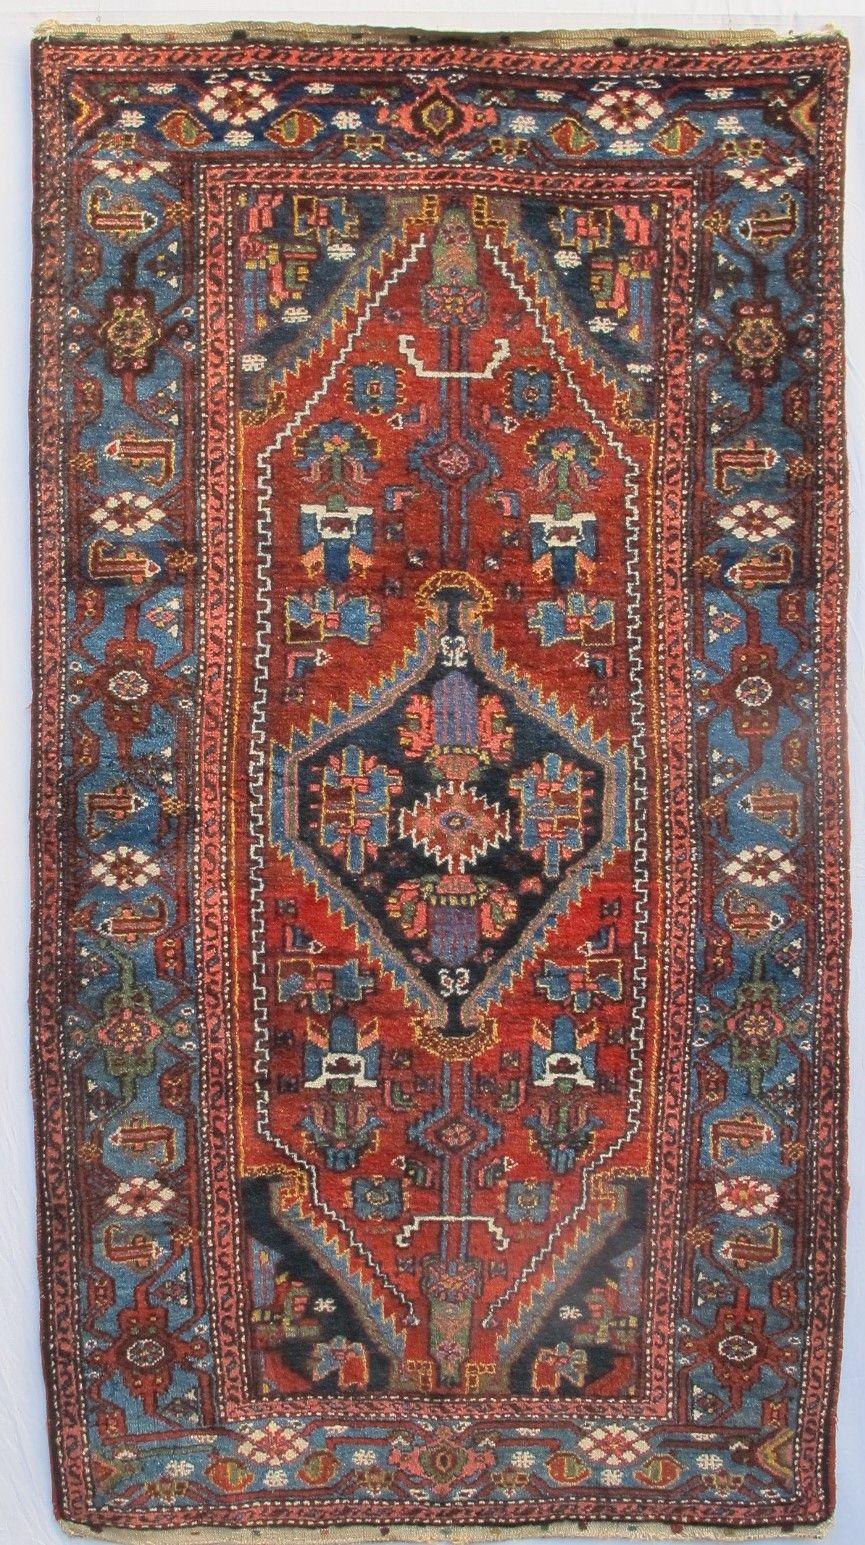 Peter Linden Woven By Village Weavers From The Khamseh District Hamadan Province W Persia C 1910 1925 S Tribal Carpets Antique Textiles Oriental Carpets